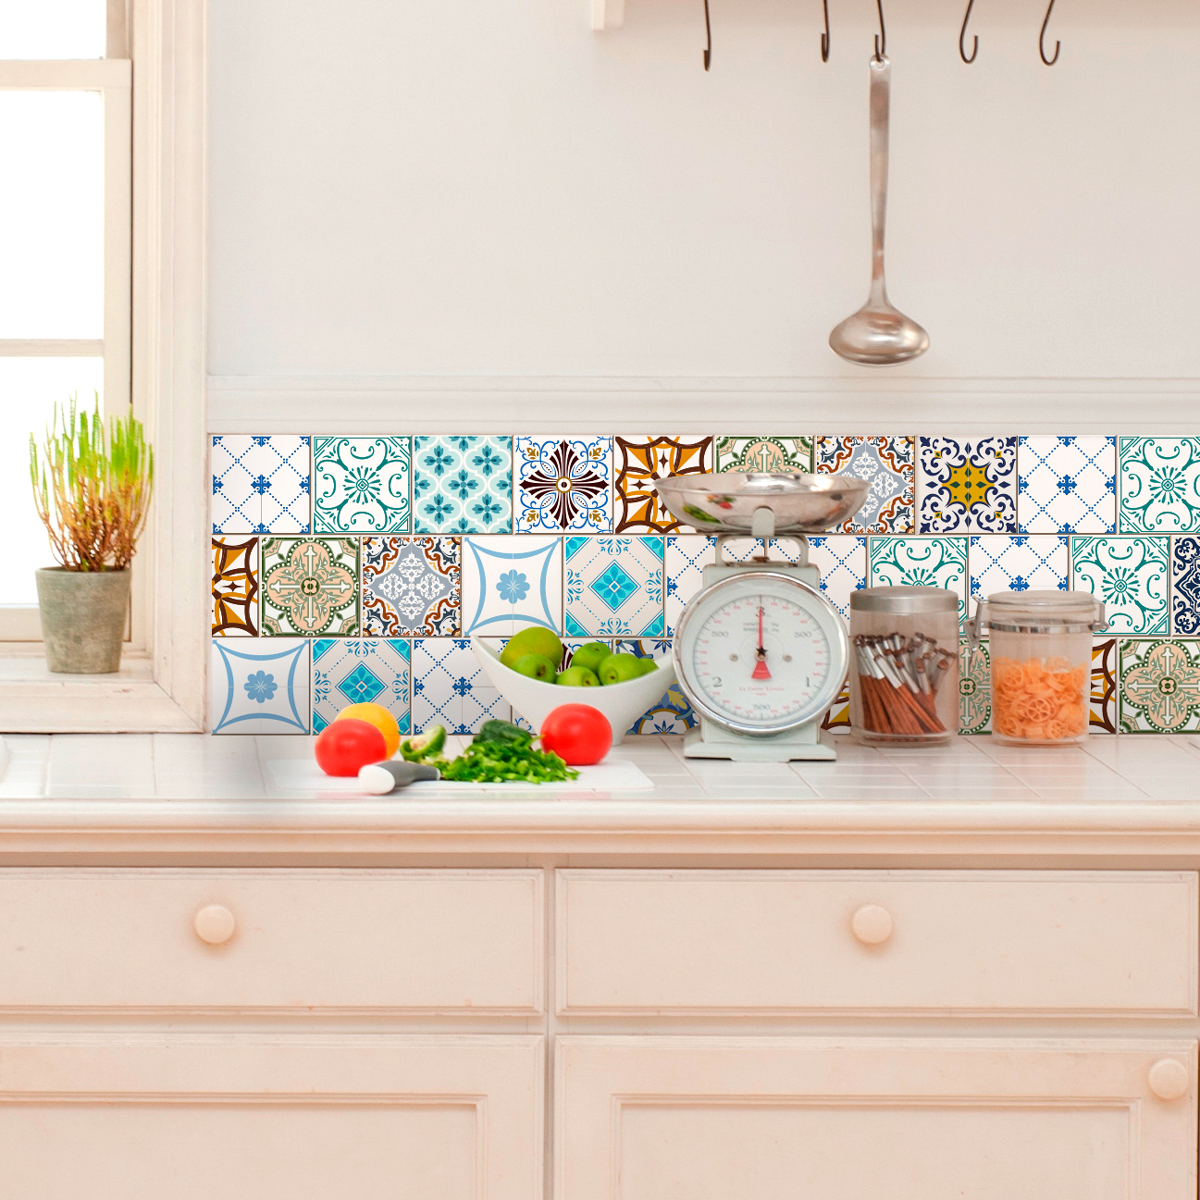 16 stickers carrelages azulejos artistiques mosa ques. Black Bedroom Furniture Sets. Home Design Ideas